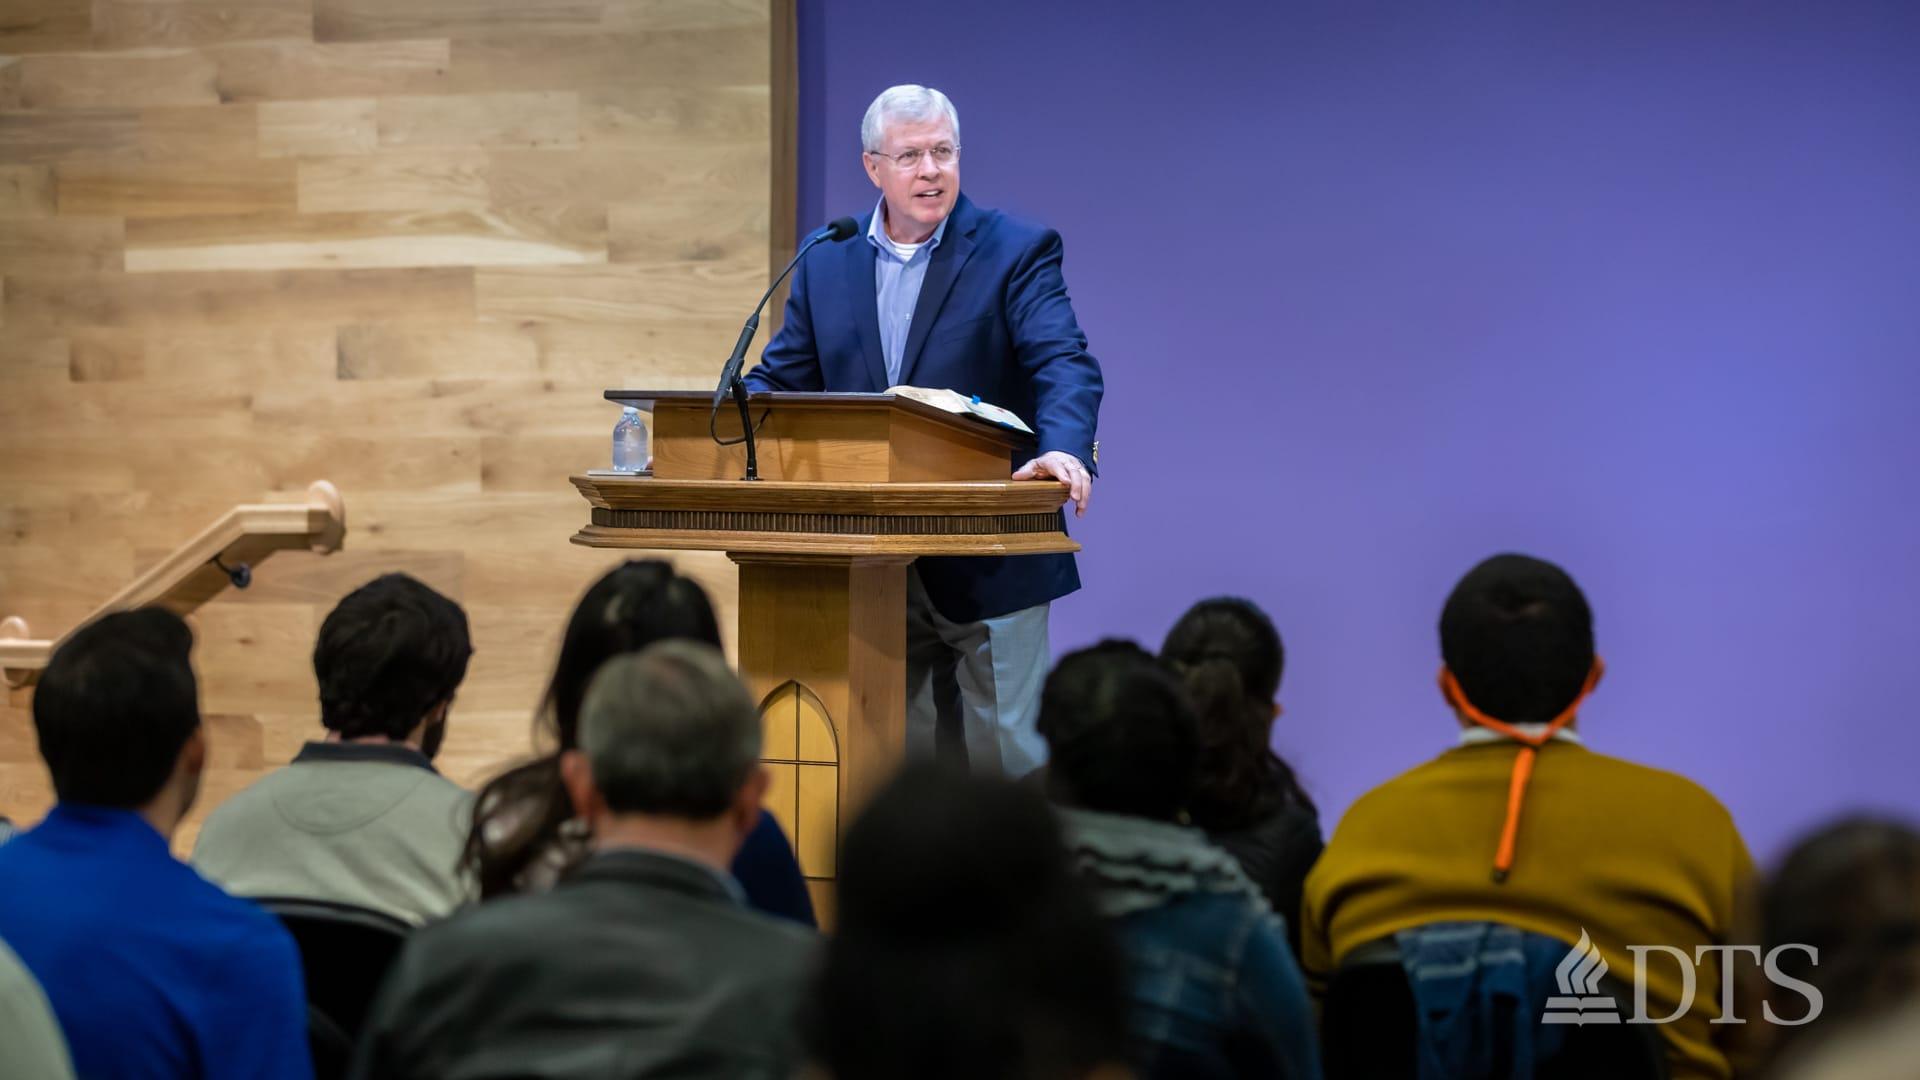 man standing at podium speaking at DTS Chapel